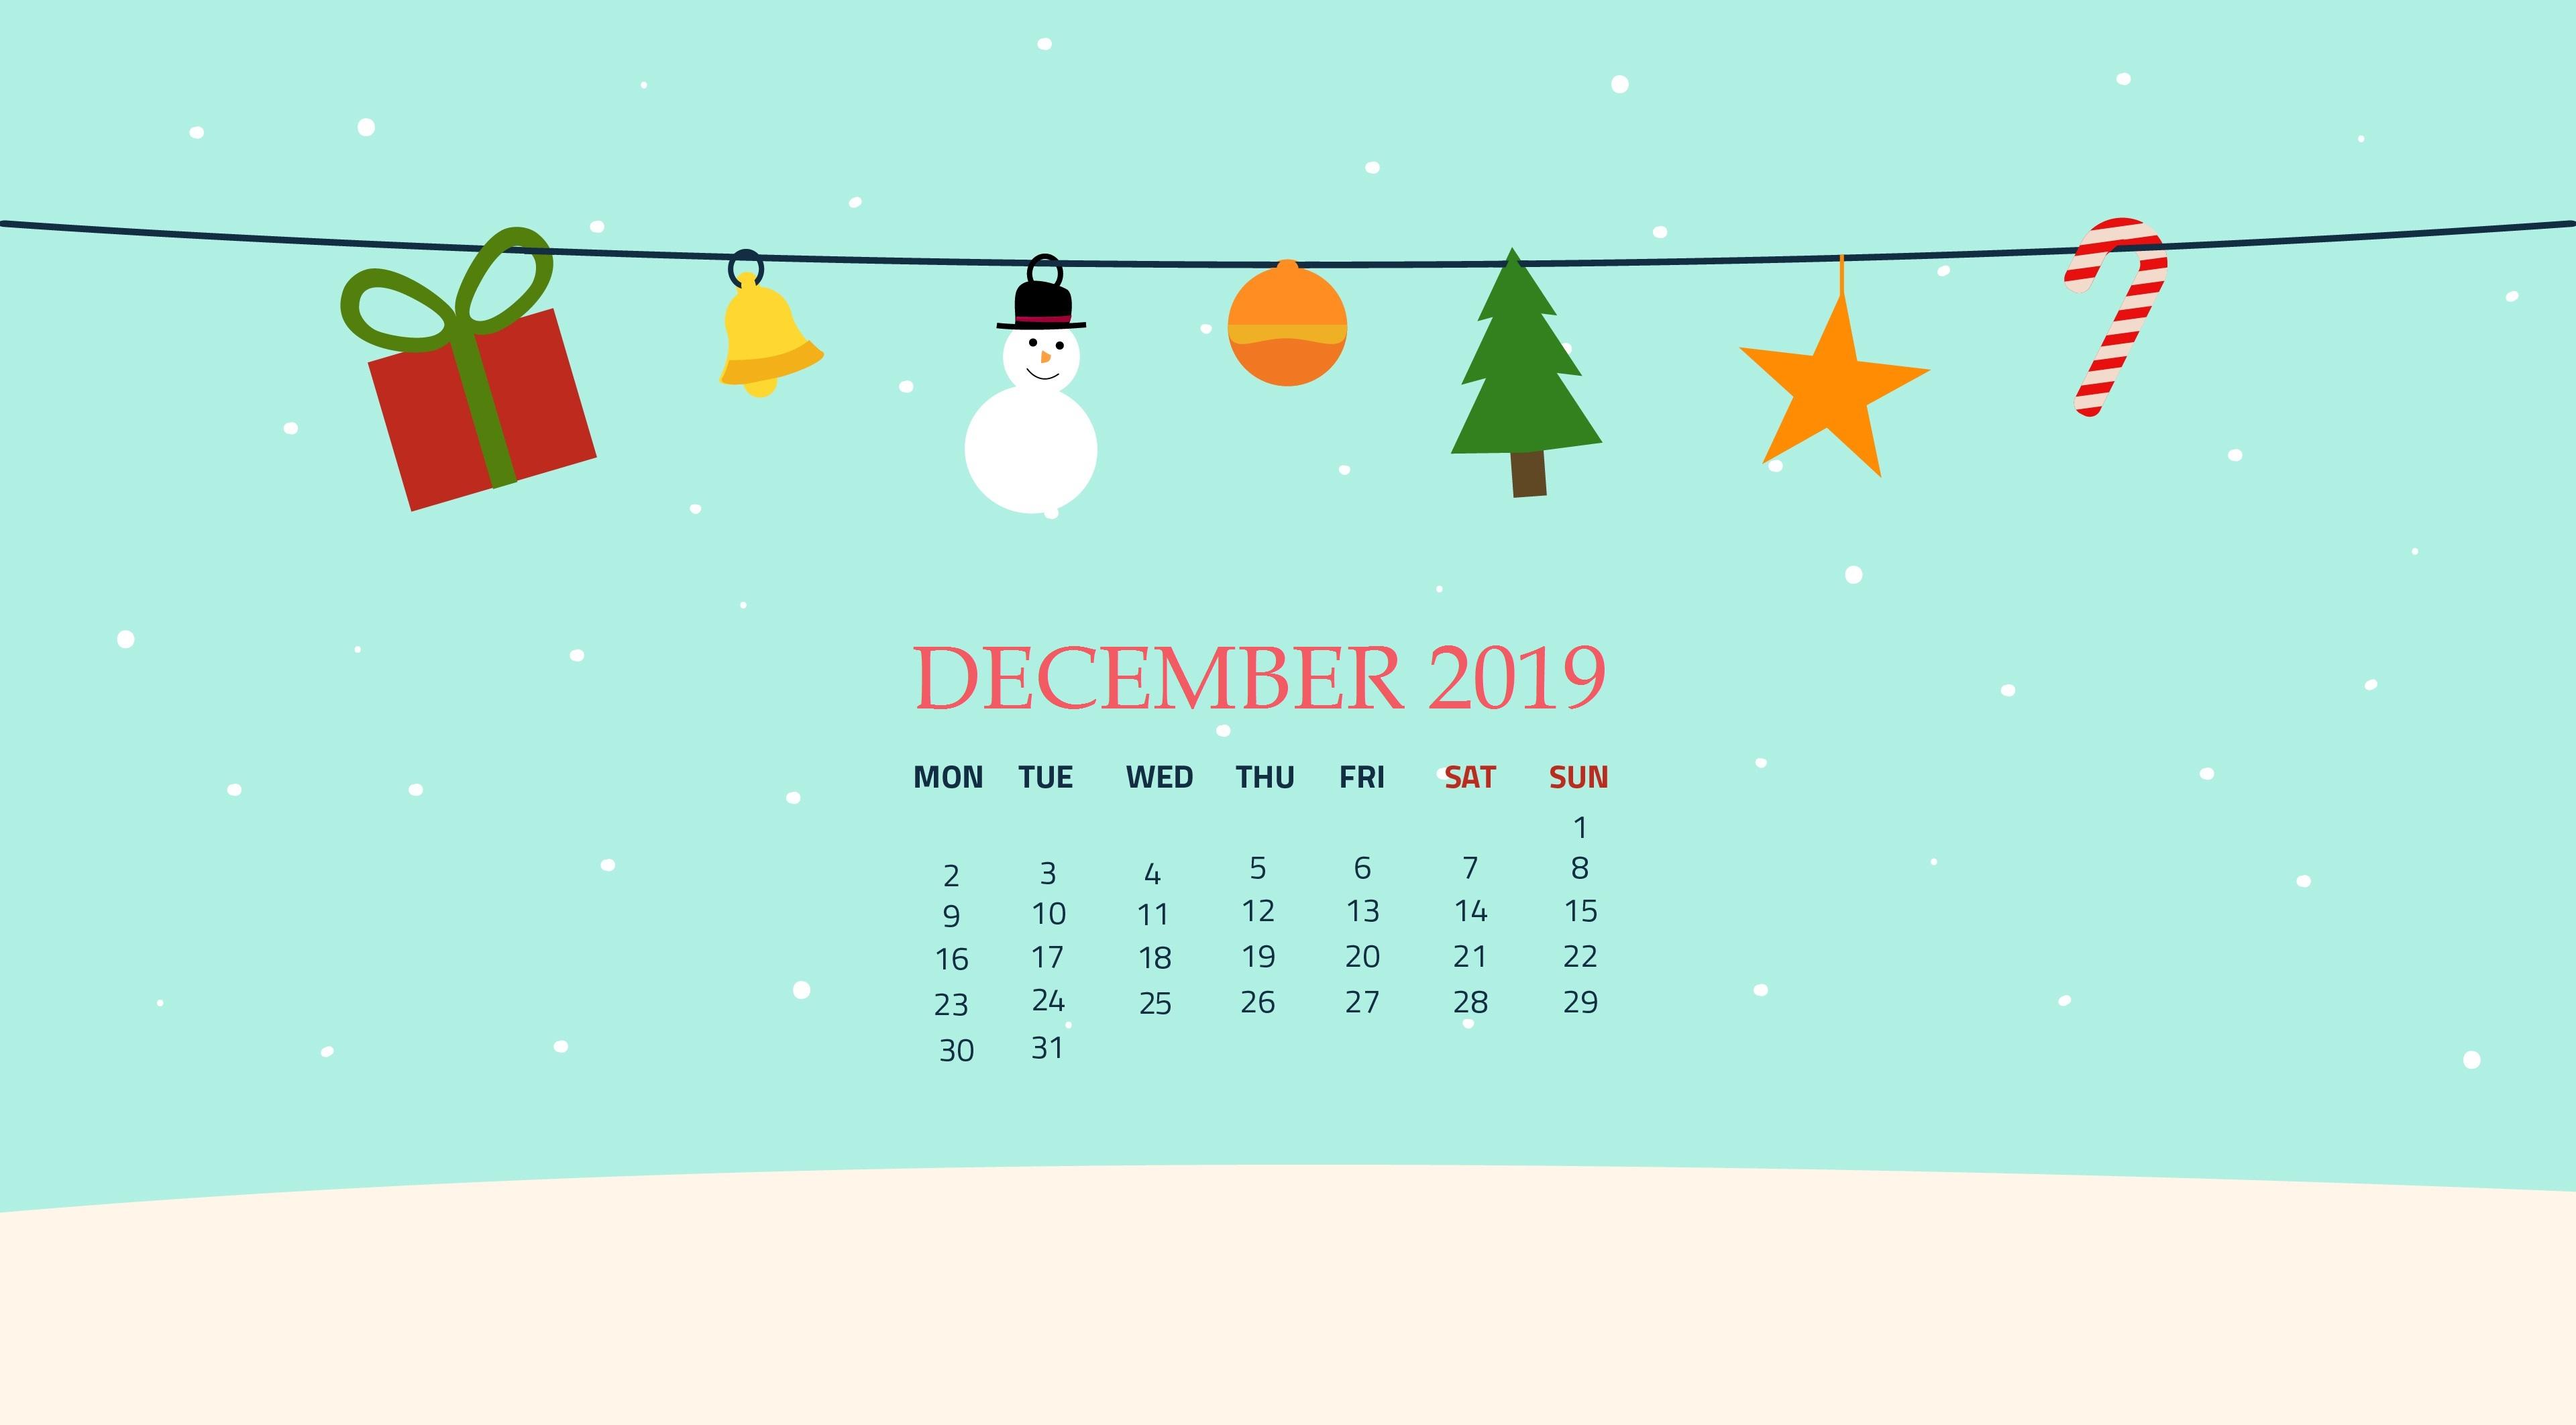 Free December 2019 Wallpaper